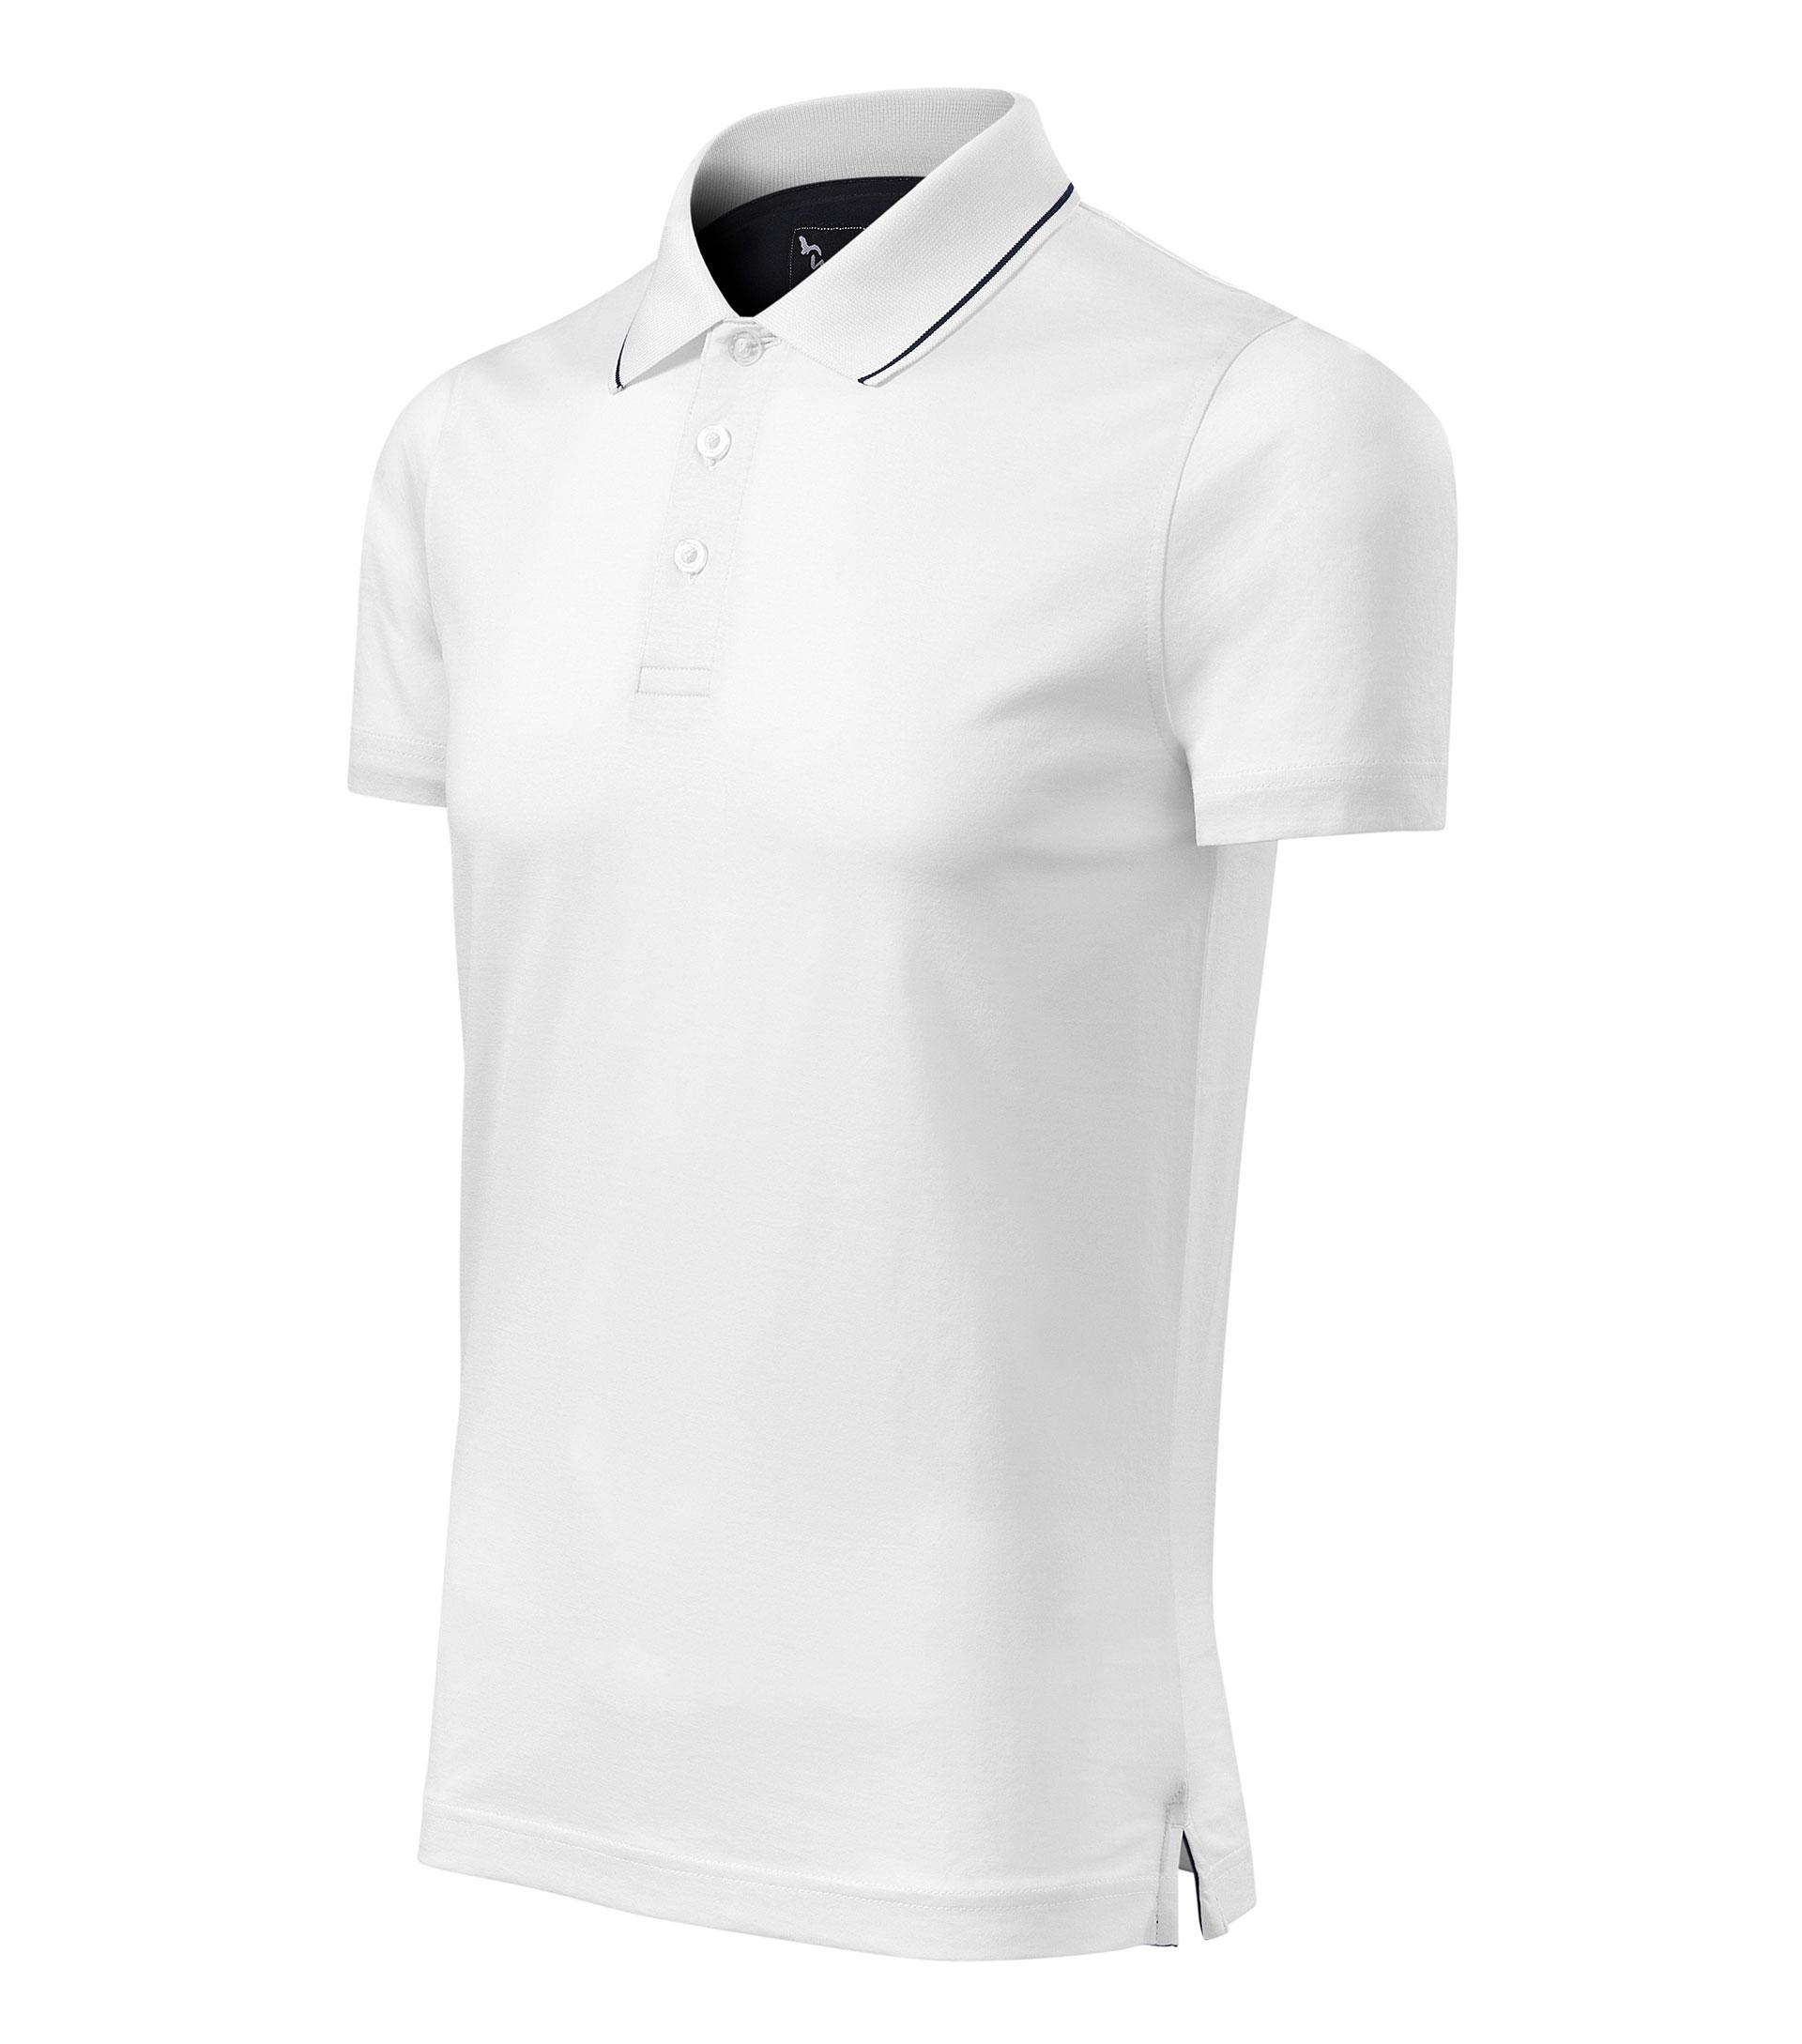 Malfini férfi pólóing mercerizált Grand fehér S 77ad31569e